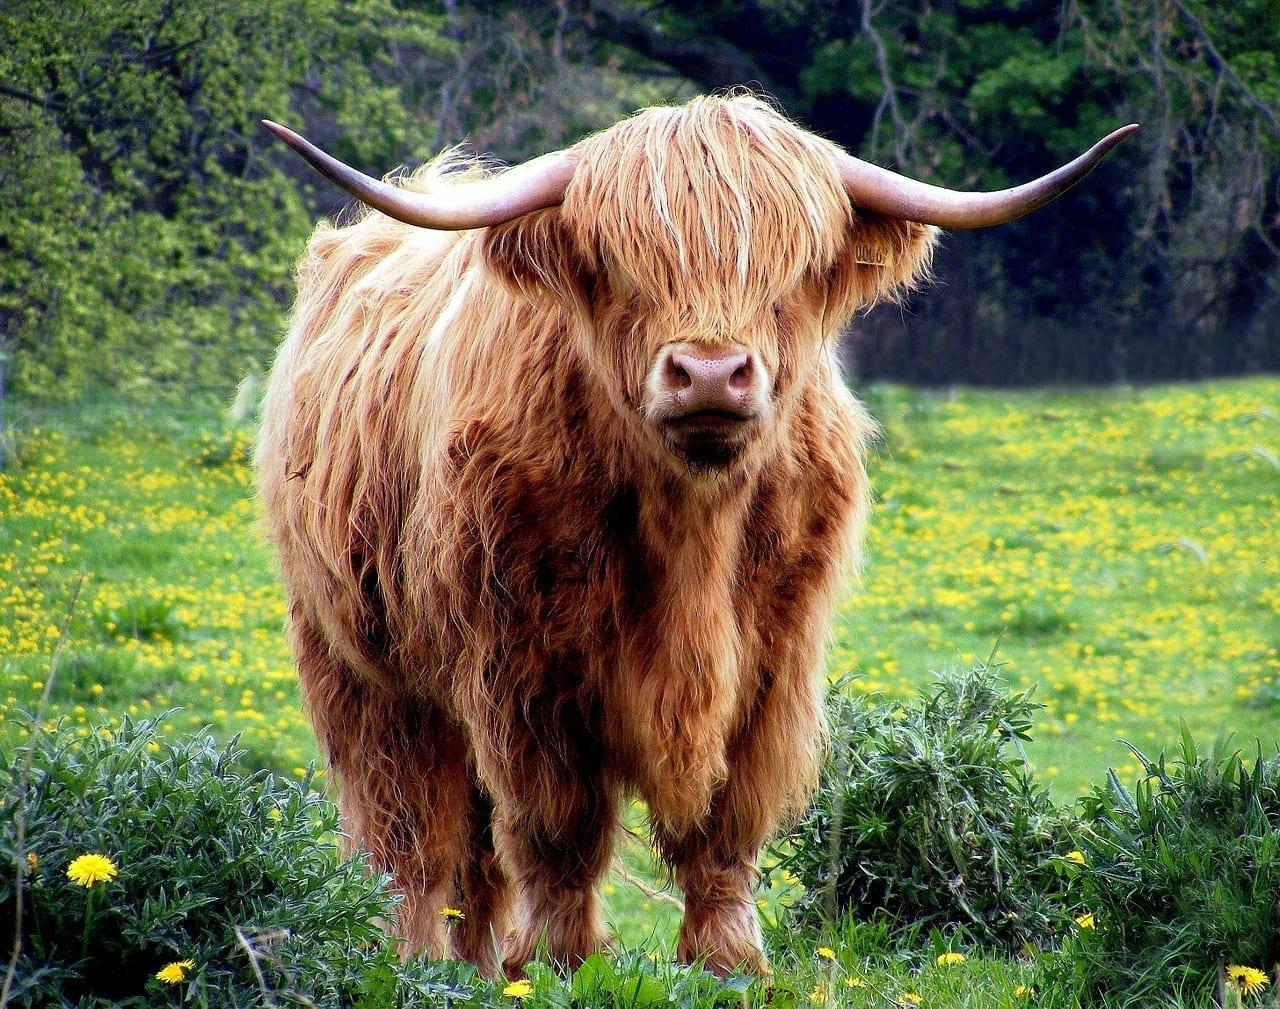 El toro de oro 1